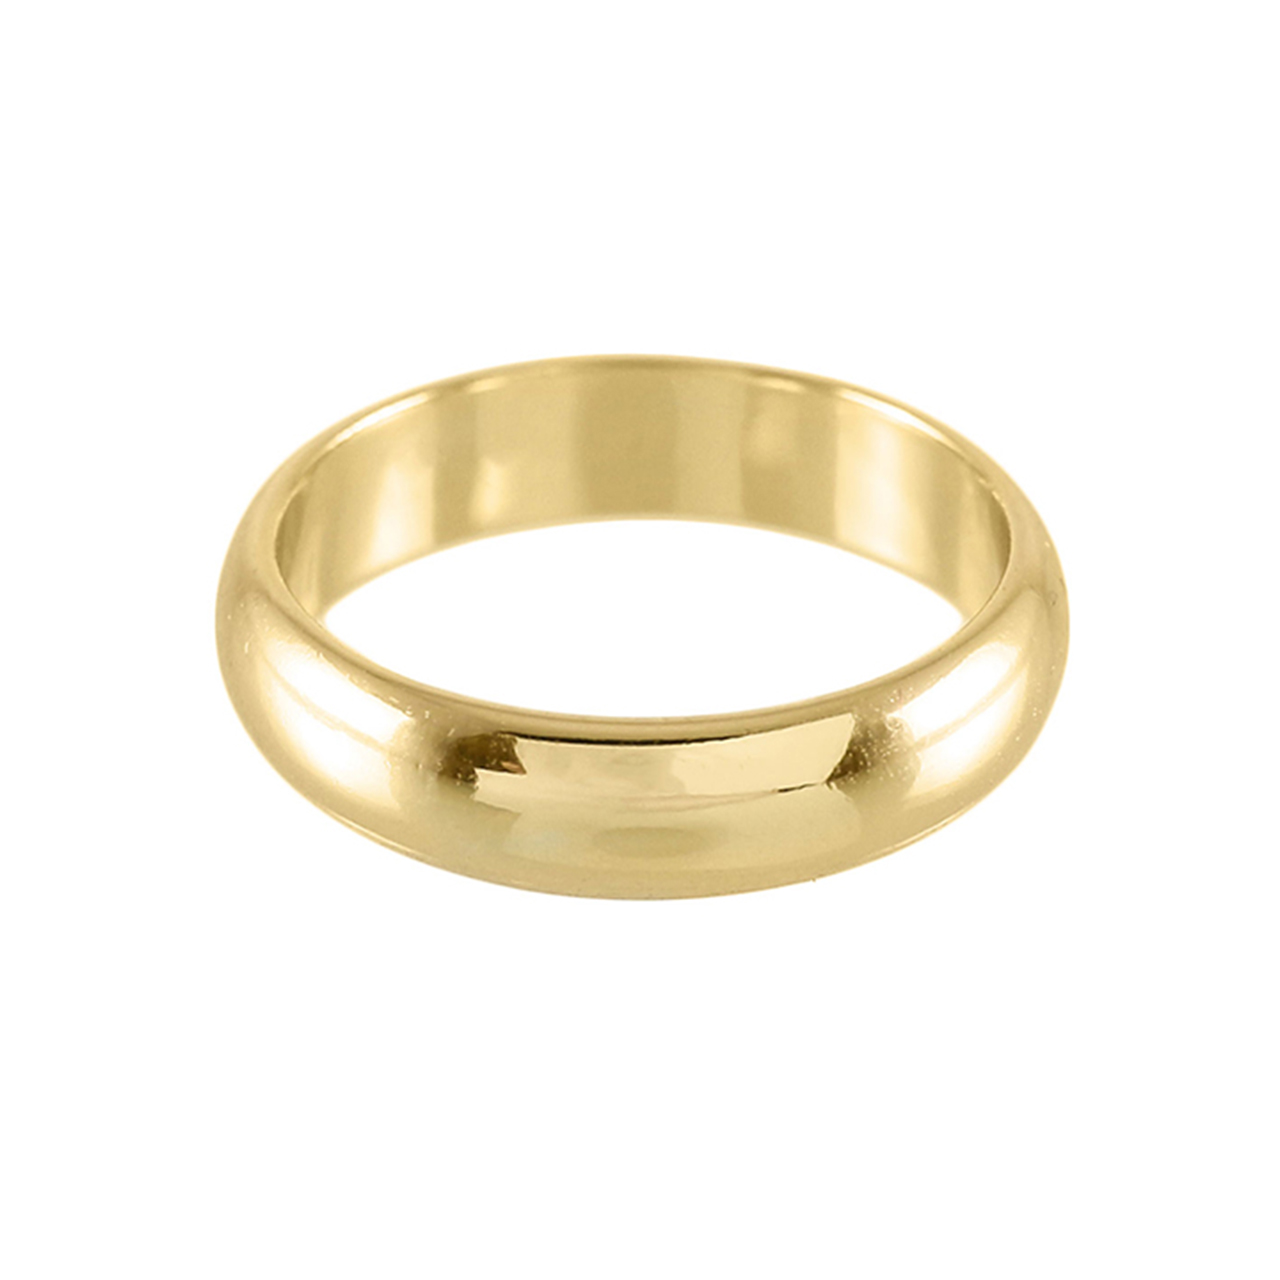 قیمت انگشتر طلا 18 عیار نازنین کد T7810